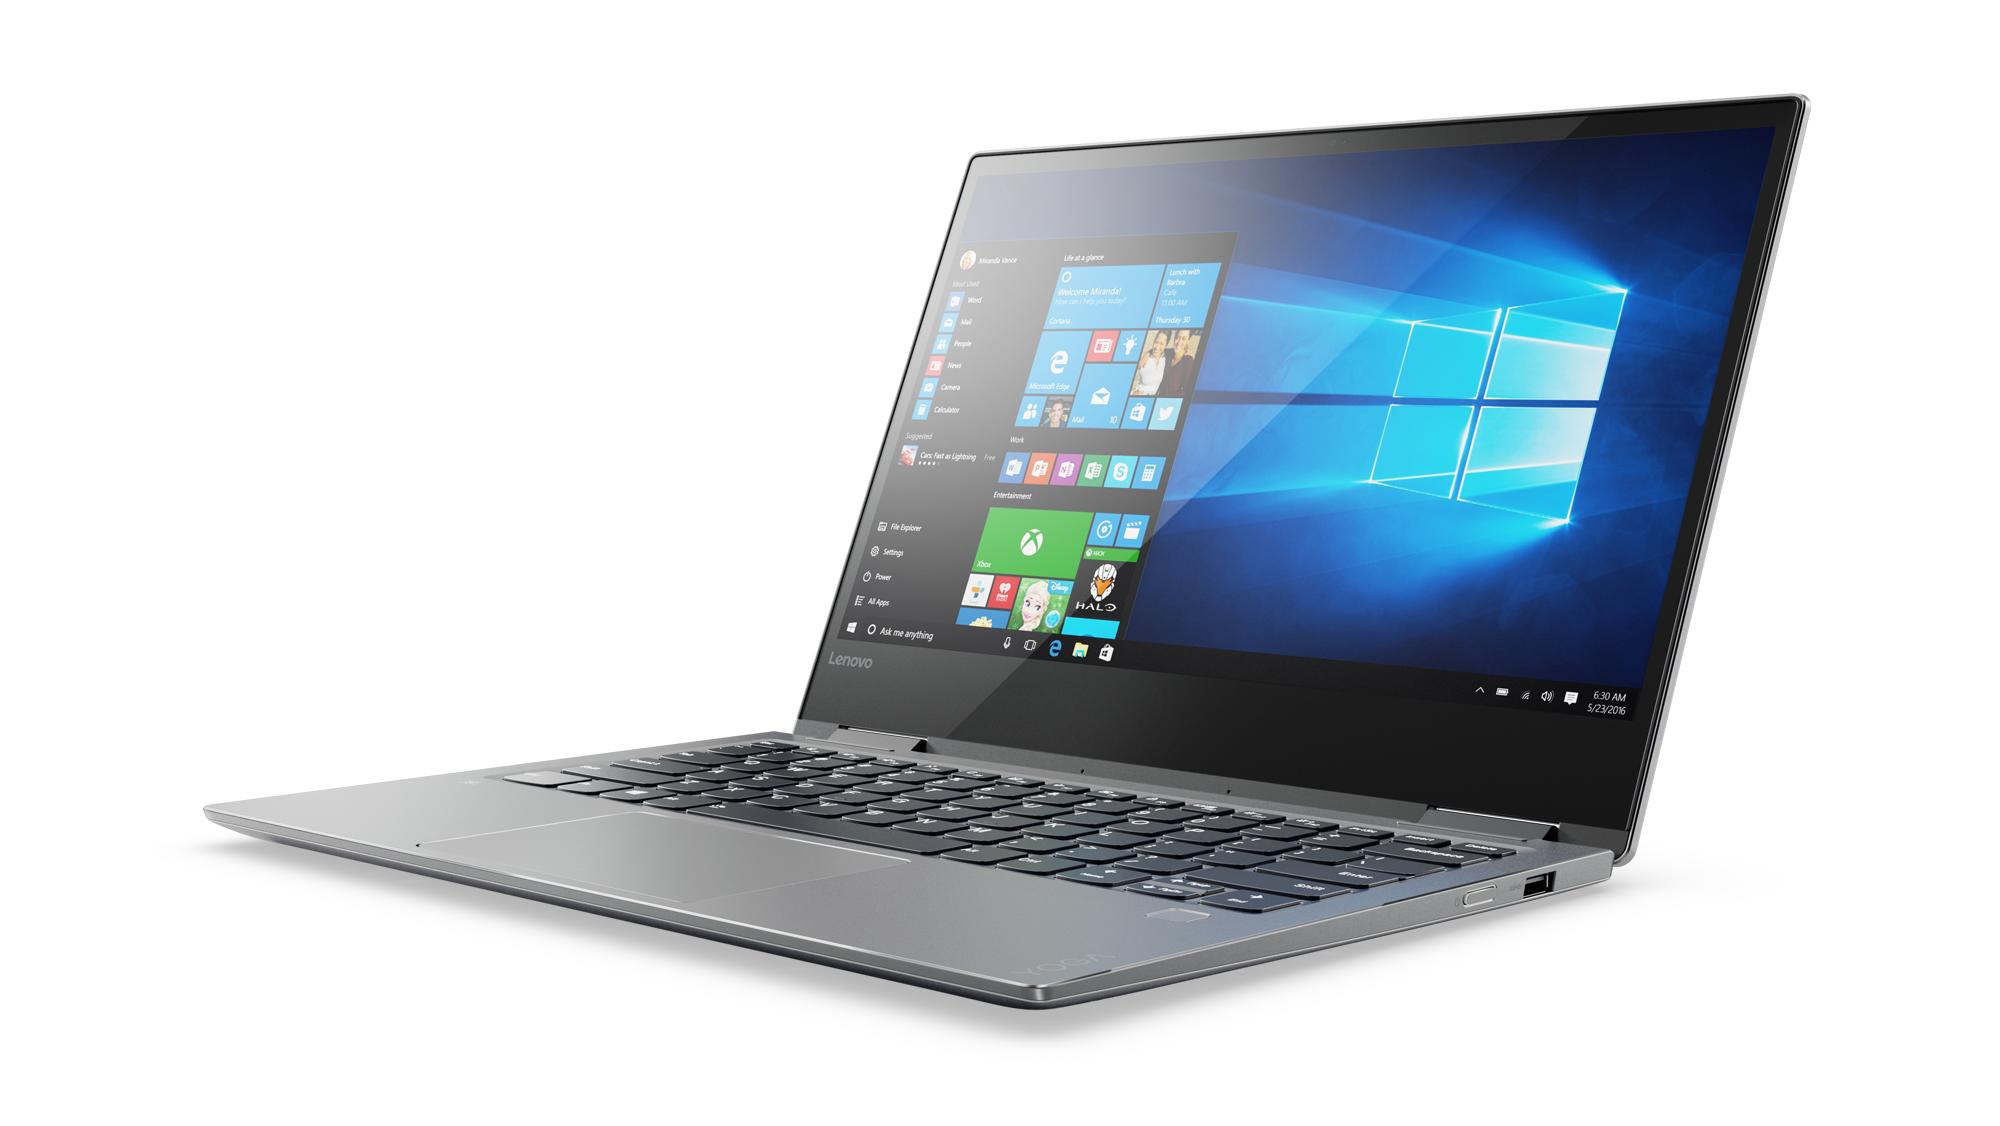 "Lenovo YOGA 720-13IKB i5-7200U 3,50GHz/8GB/SSD 256GB/13,3"" FHD/IPS/AG/multitouch/WIN10 šedá 80X6006SCK"